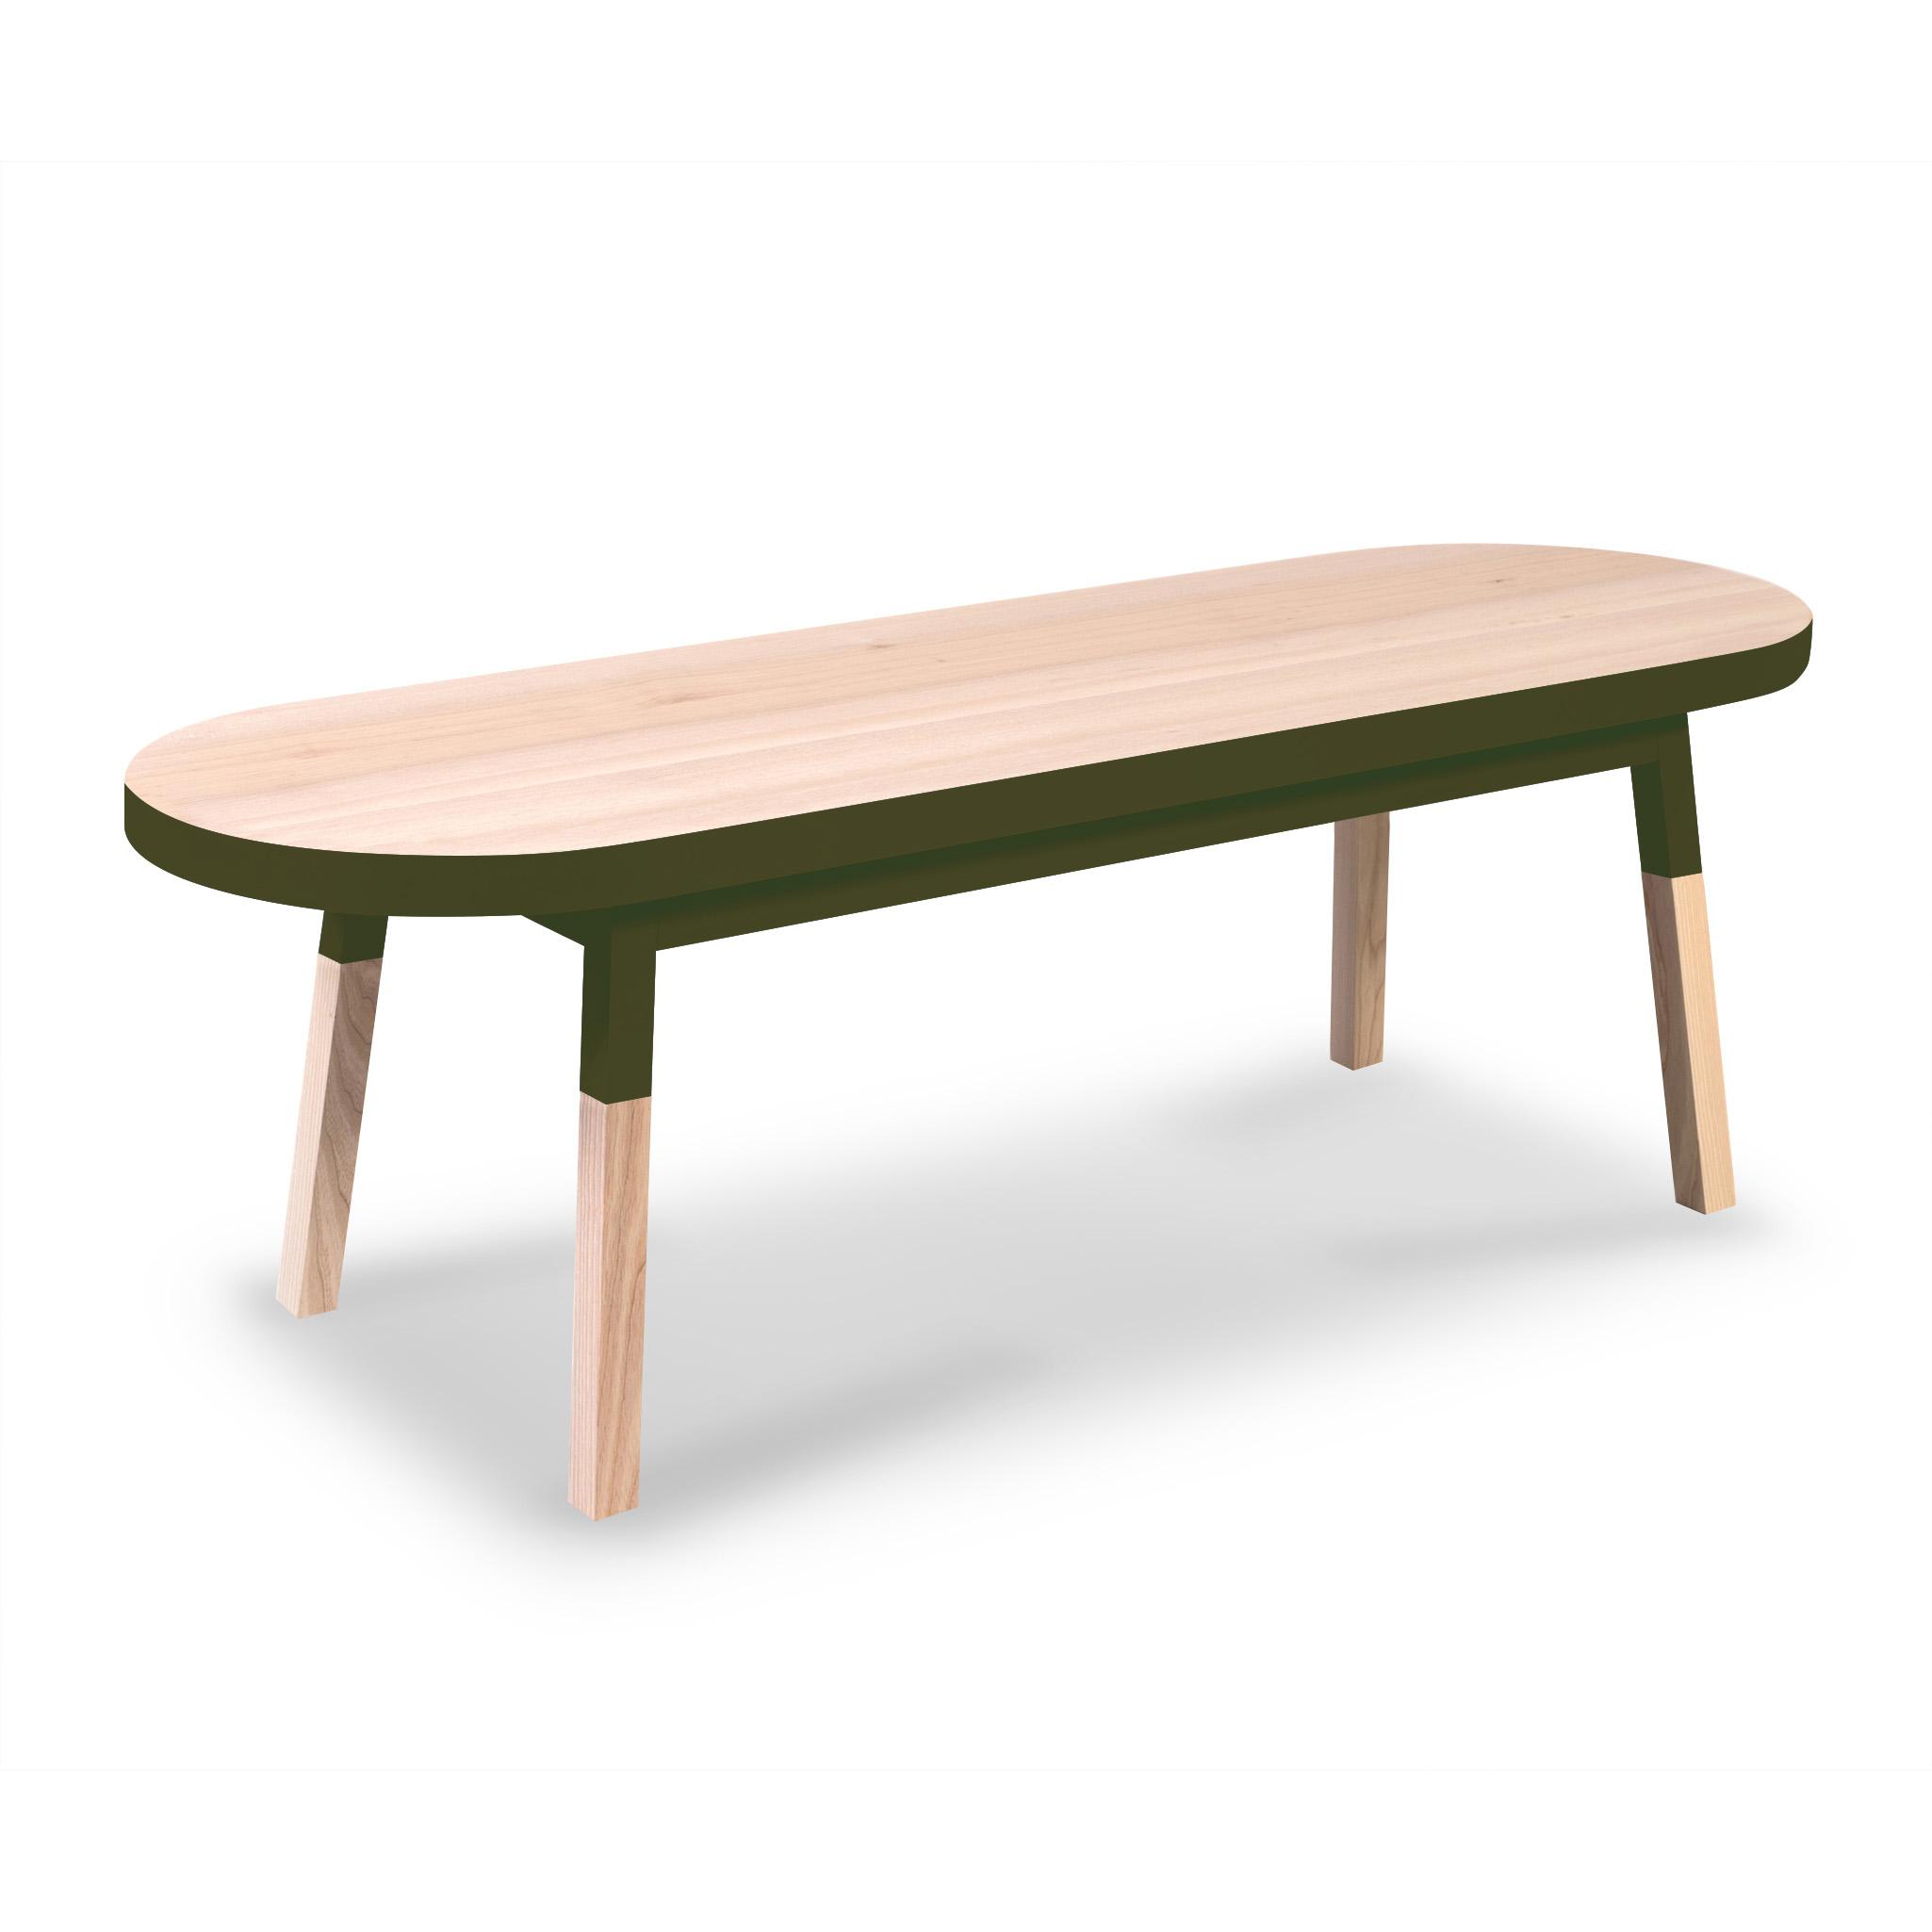 Table basse banc, 100% frêne massif vert lancieux